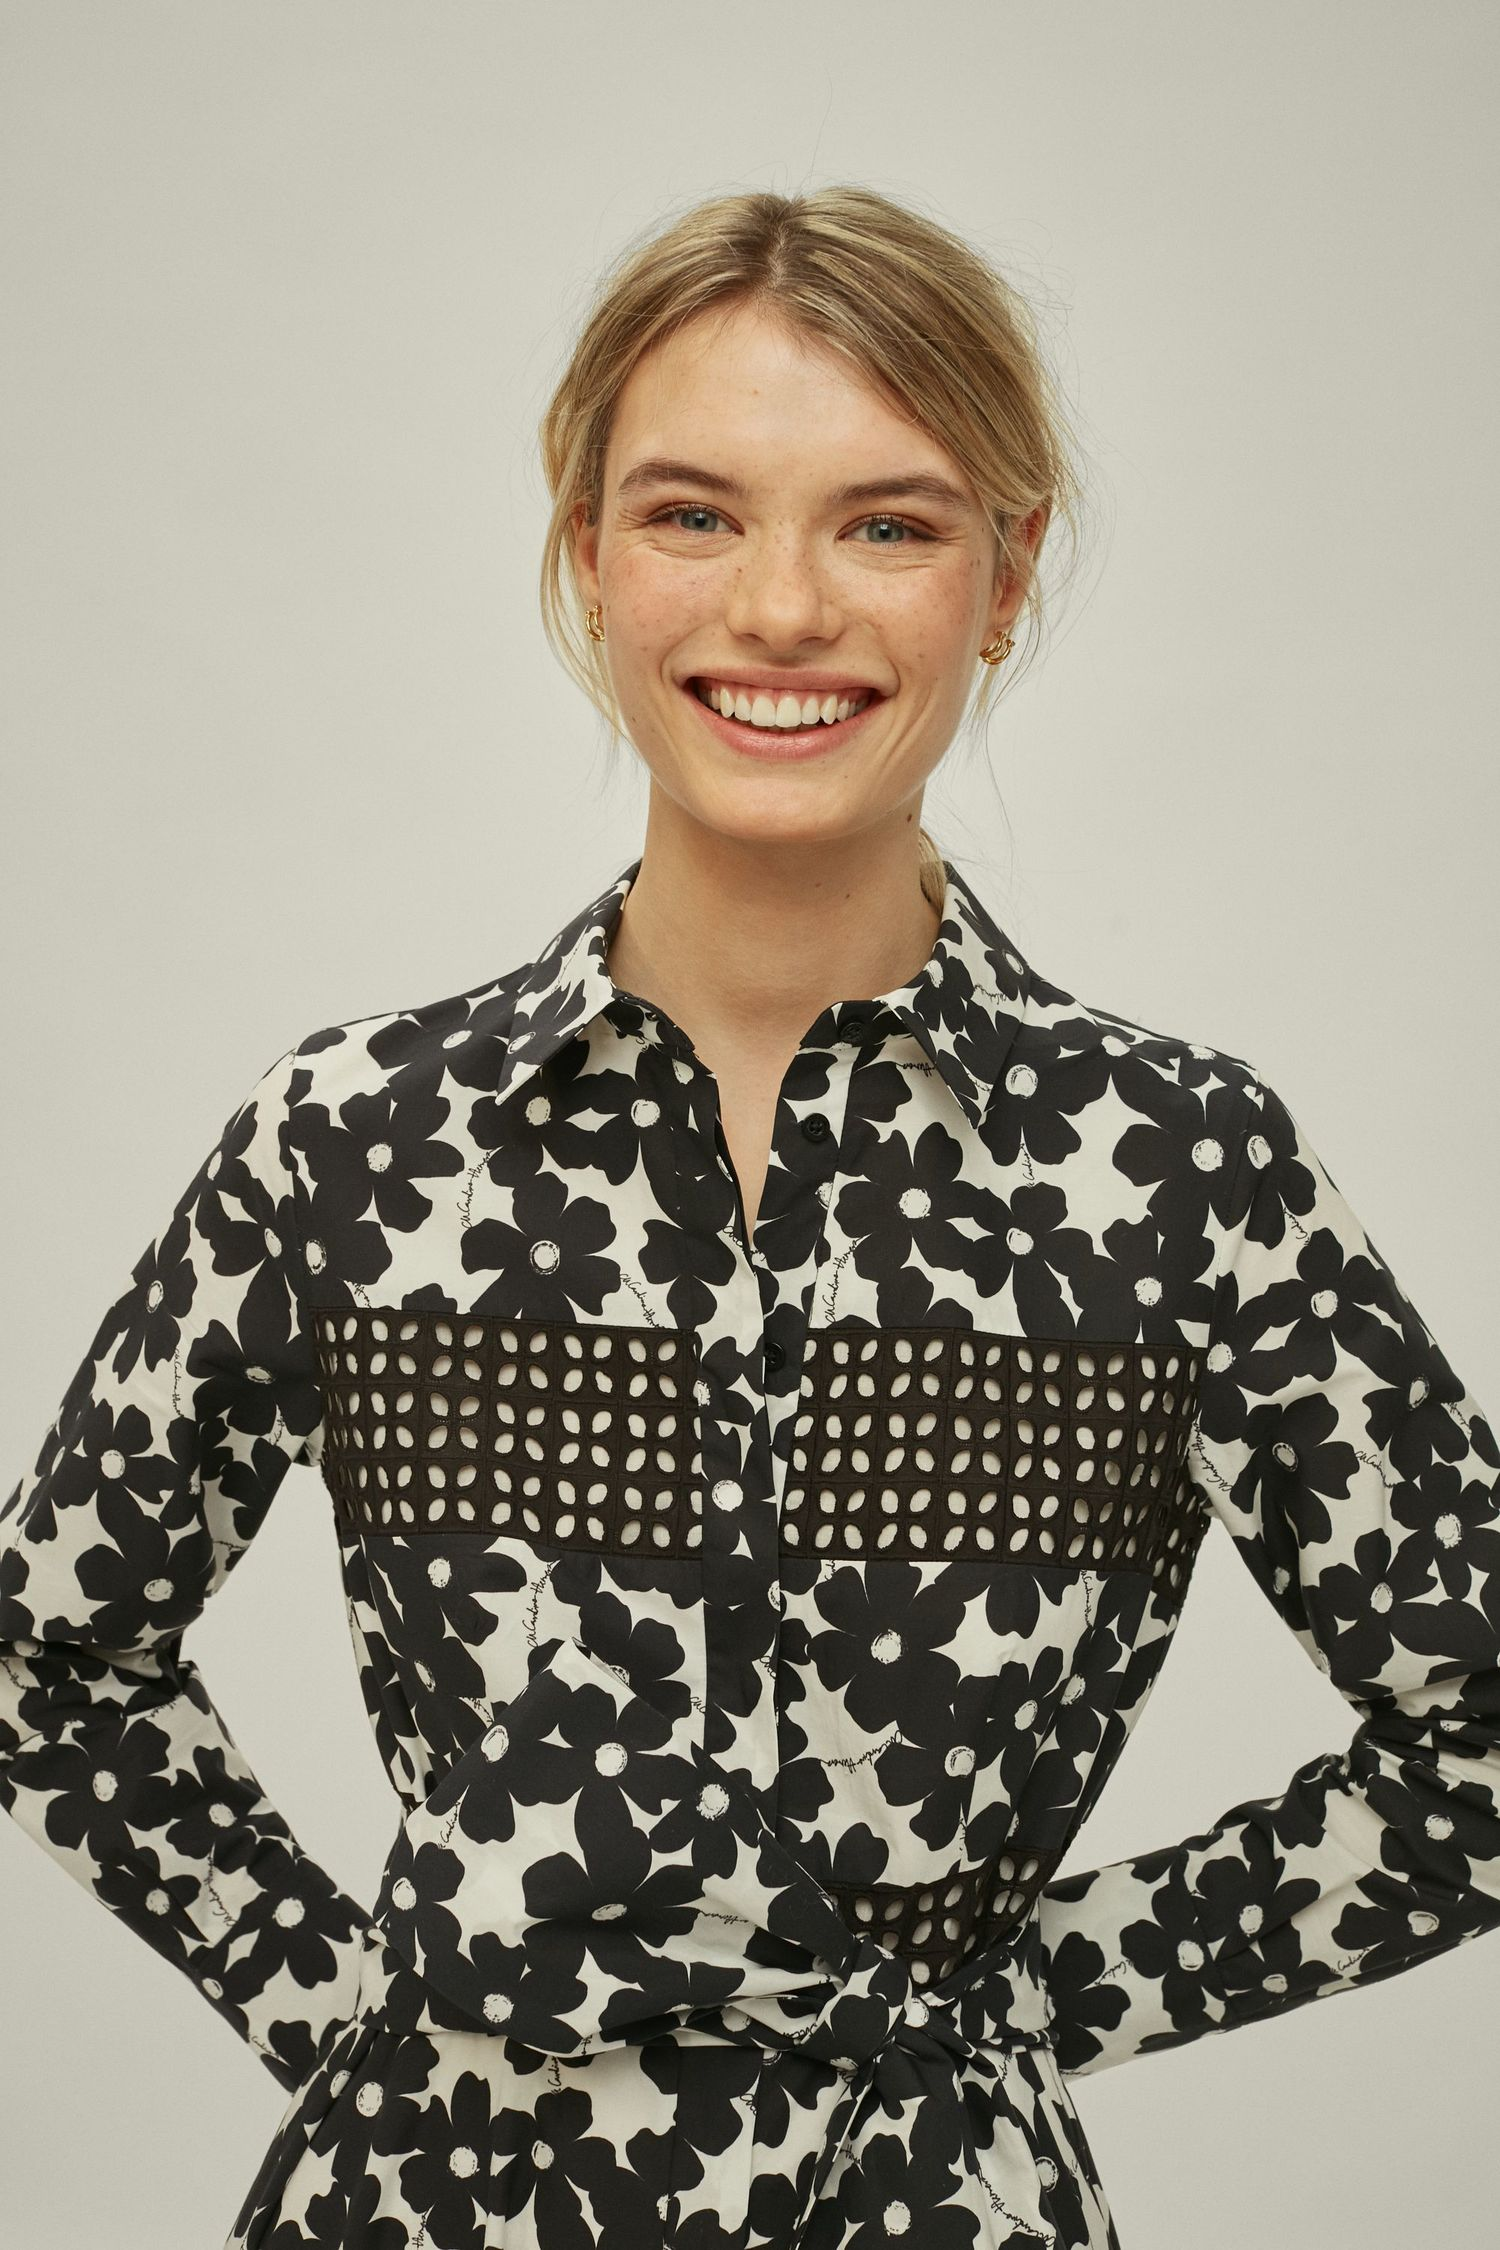 Floral poplin shirt dress